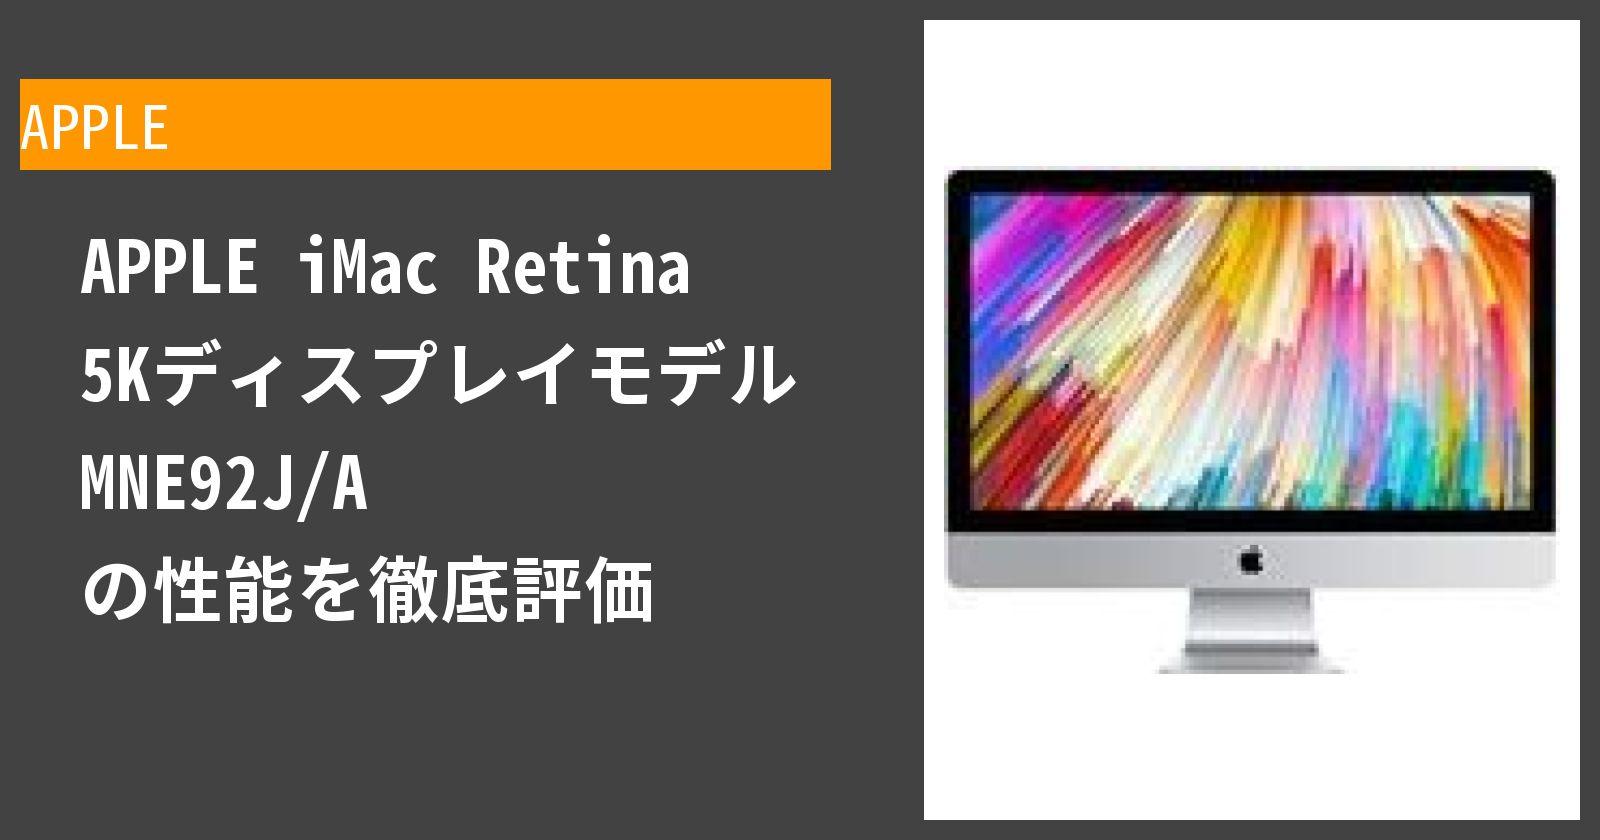 iMac Retina 5K(MNE92J/A) の性能を徹底評価